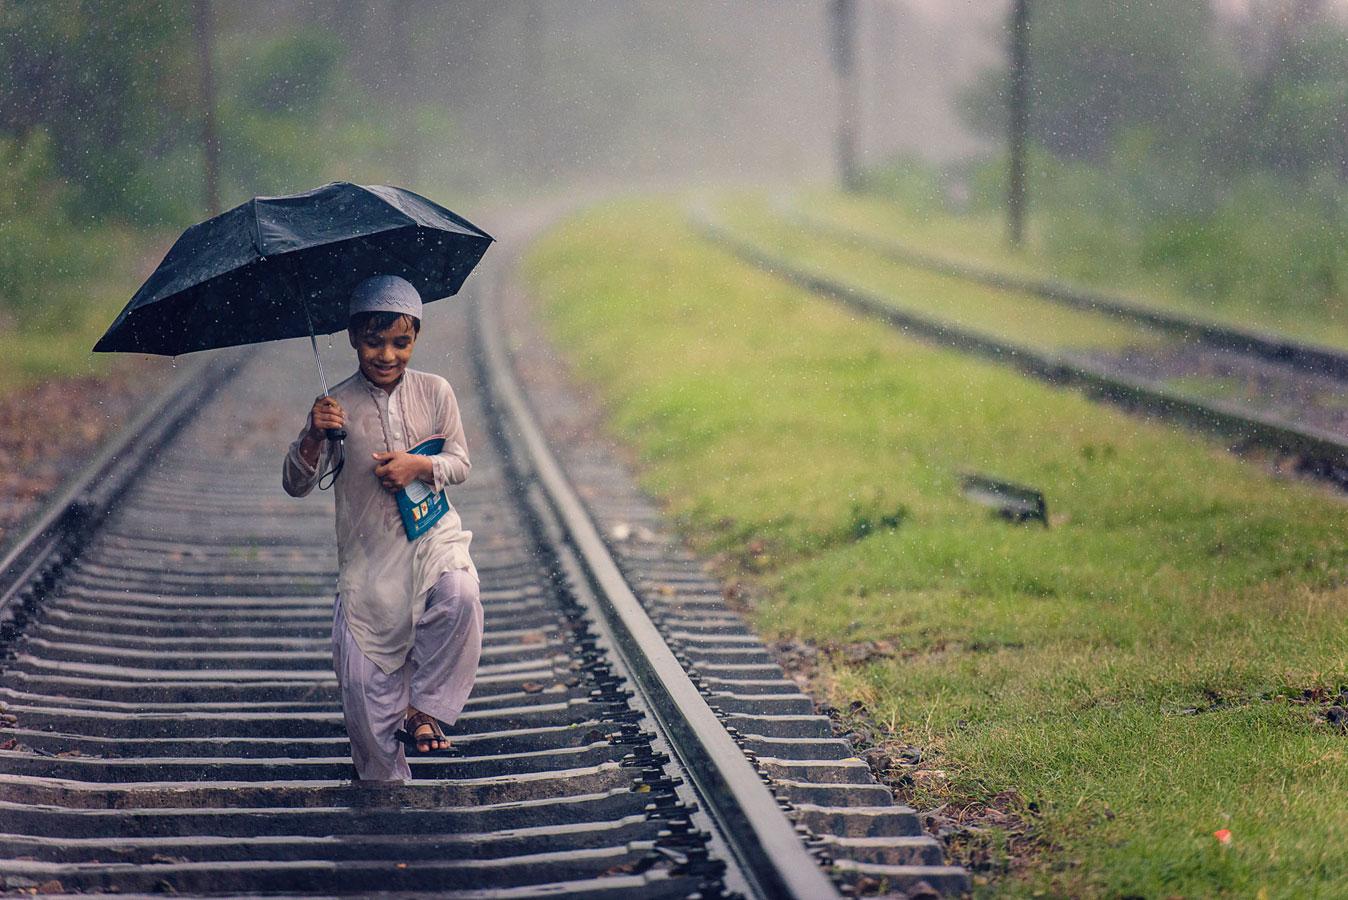 Шабир Миан, Пакистан / Shabir Mian , Pakistan, Национальная премия, Фотоконкурс Sony World Photography Awards 2017